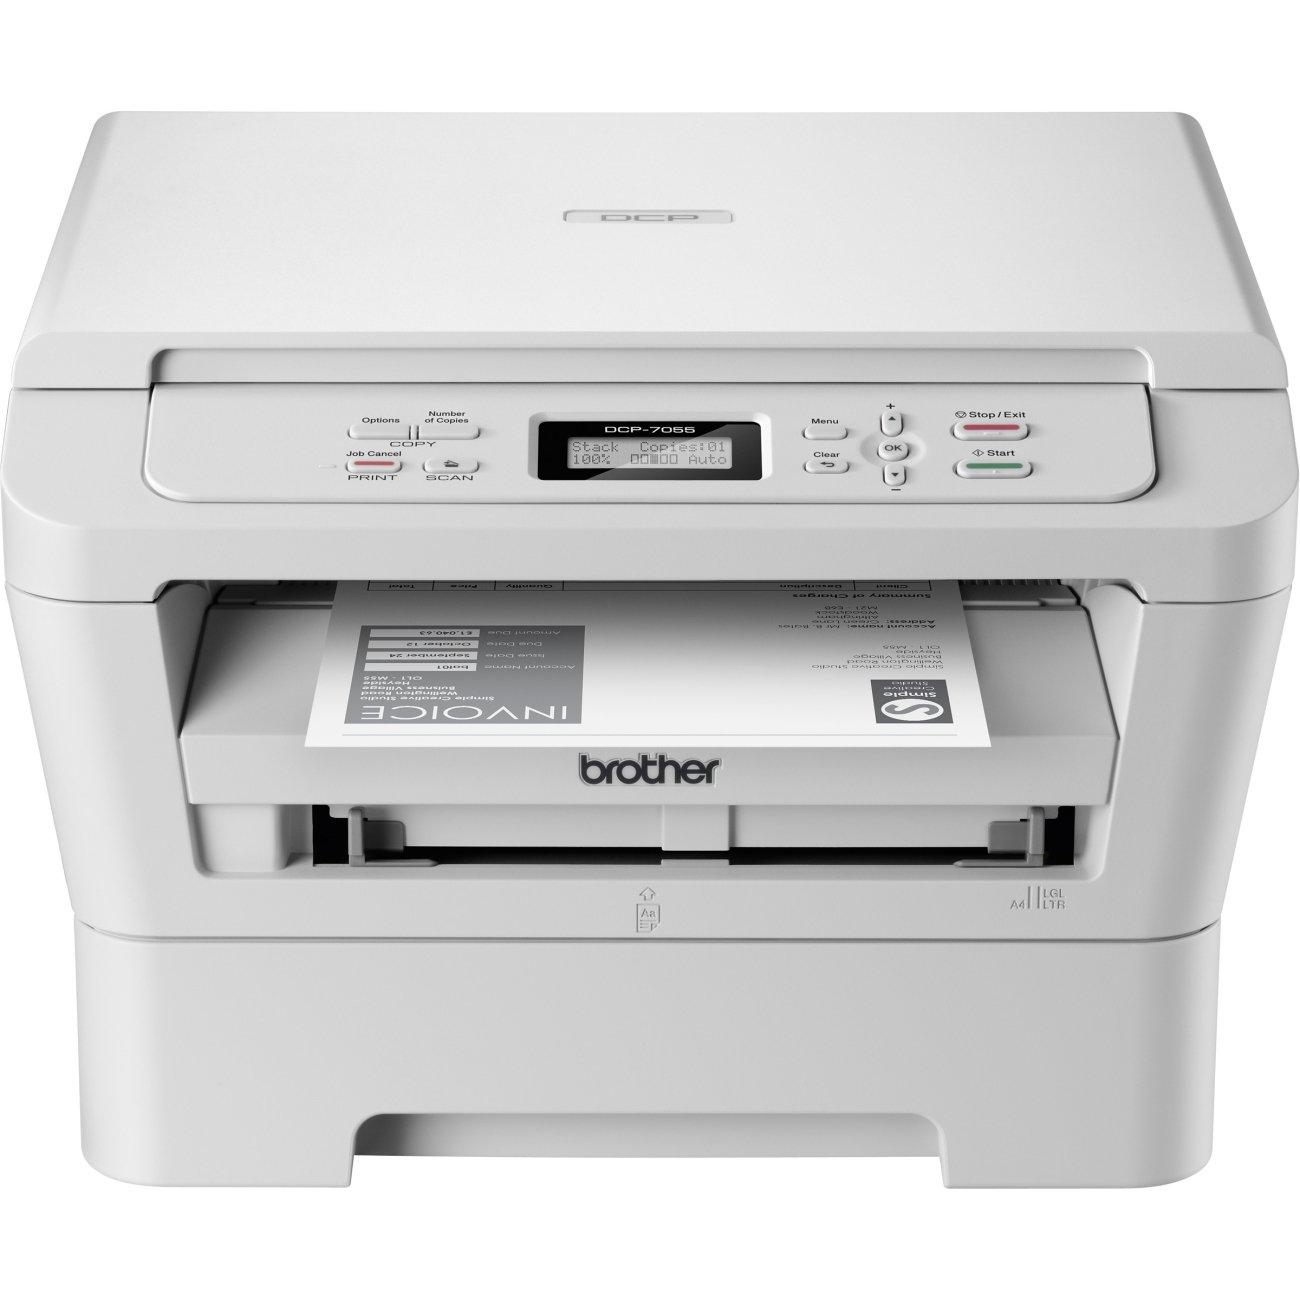 Brother DCP7055G1 - Impresora multifunción láser, blanco: Amazon ...